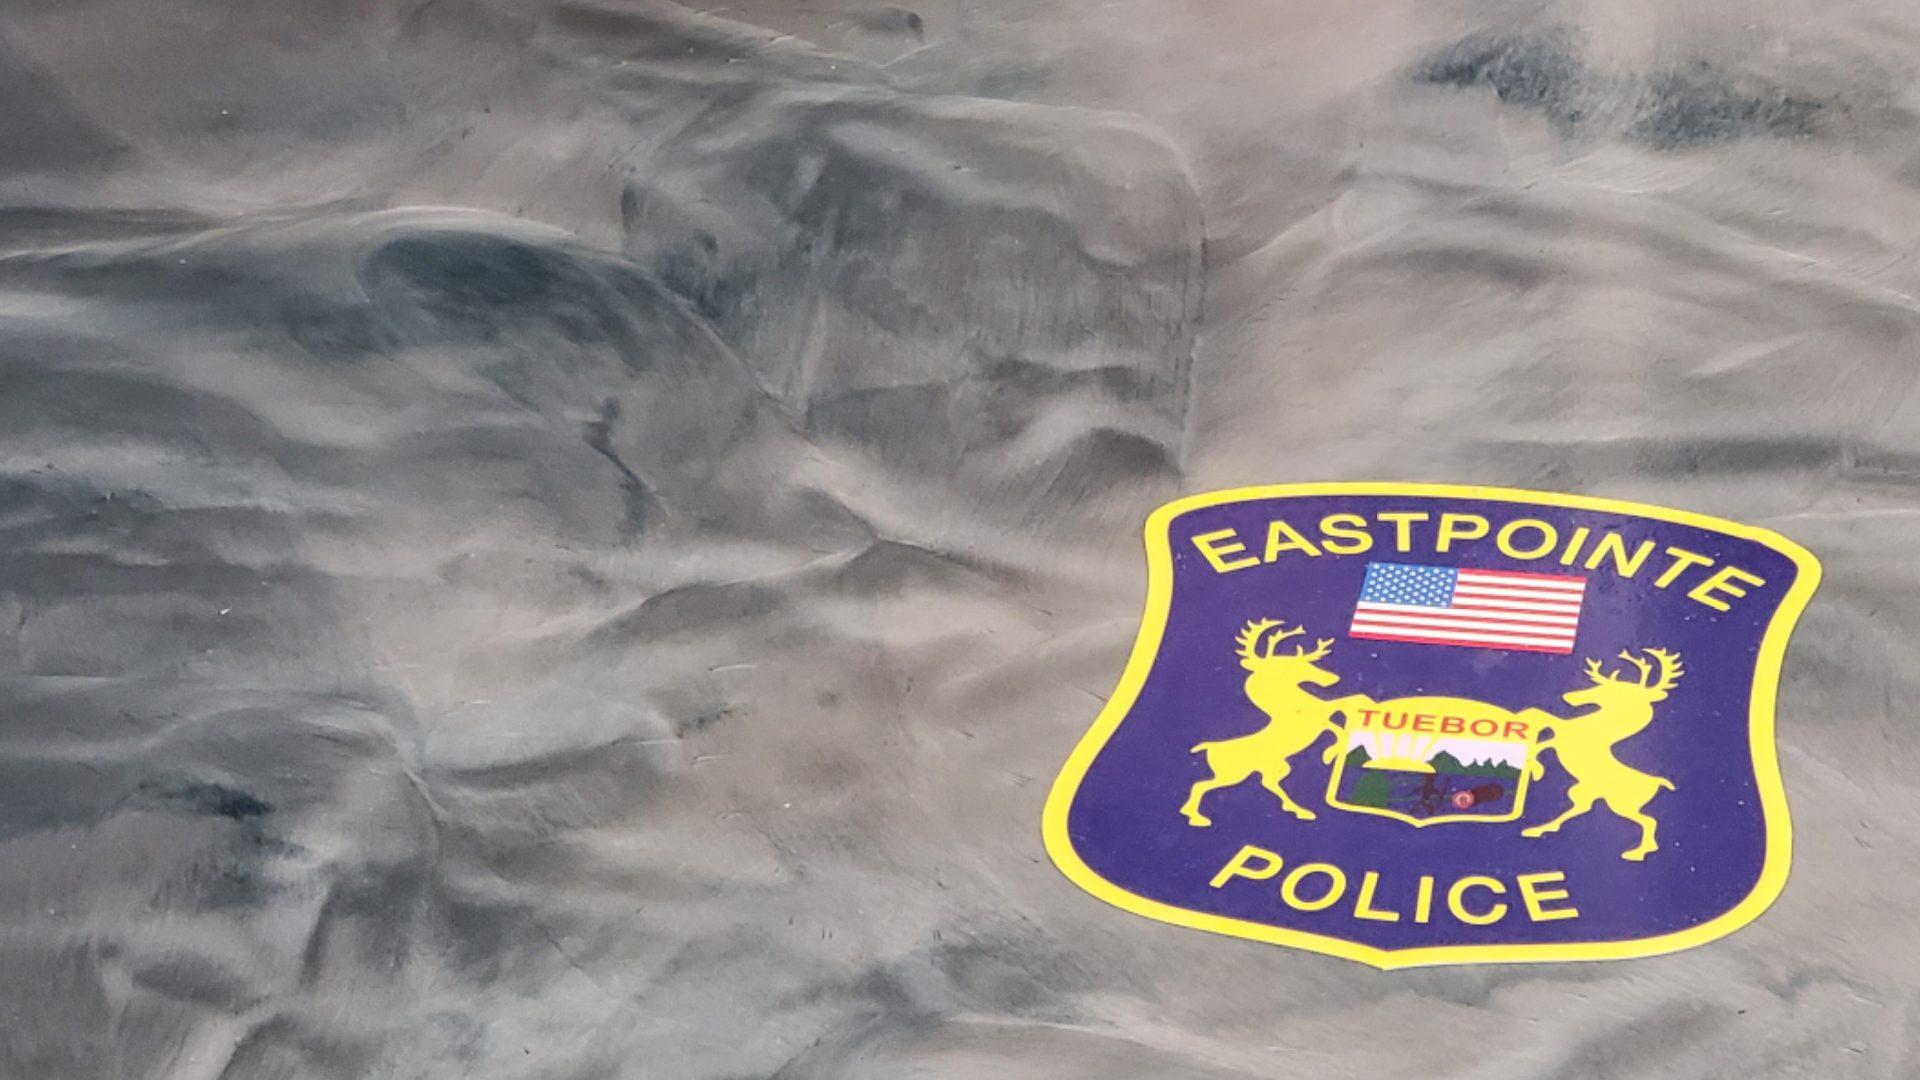 Eastpointe Police Epoxy Floor Graphic 4